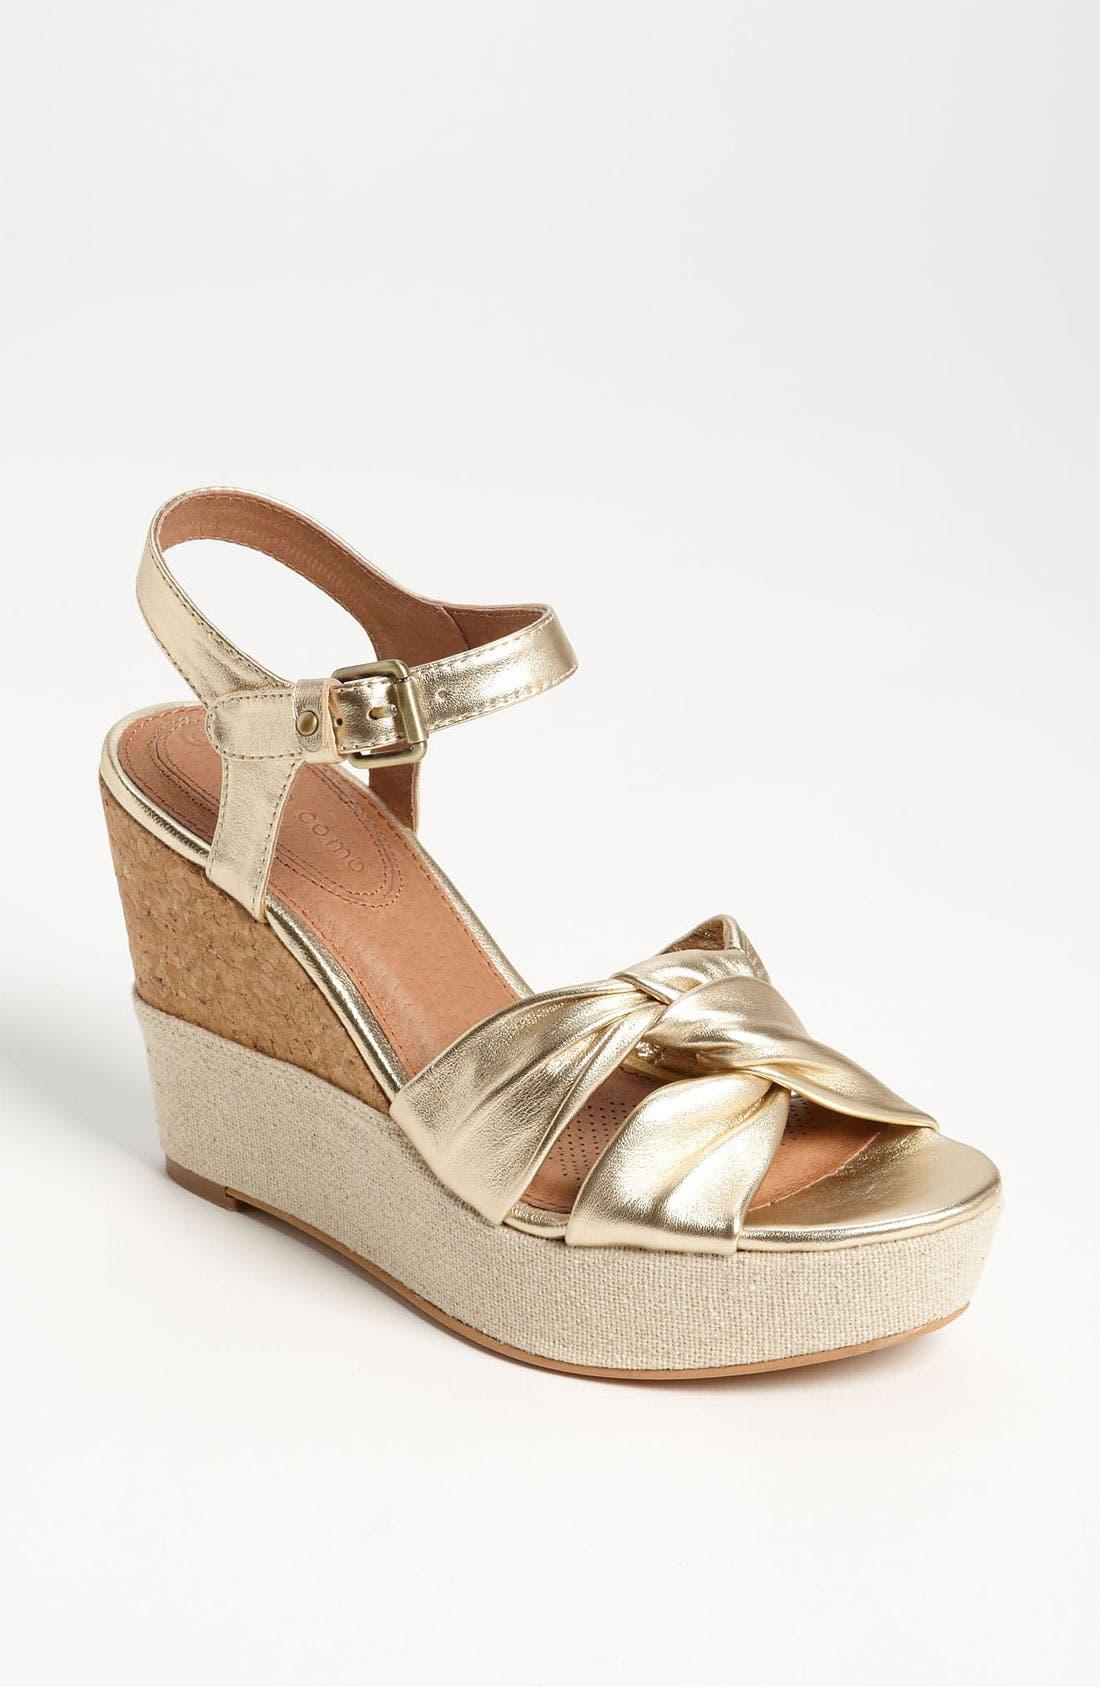 Alternate Image 1 Selected - Corso Como 'Nani' Sandal